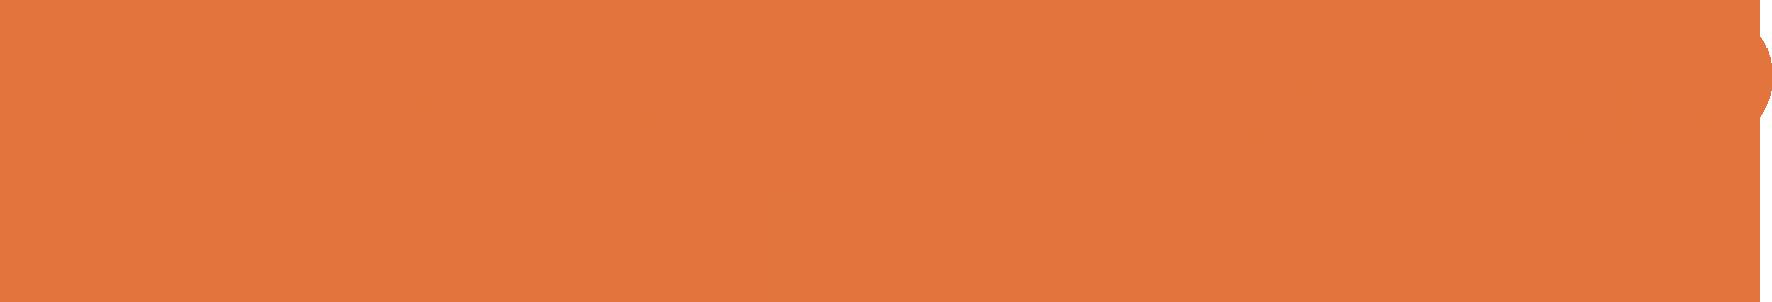 Tales From The Loop Logo-TFL-orange